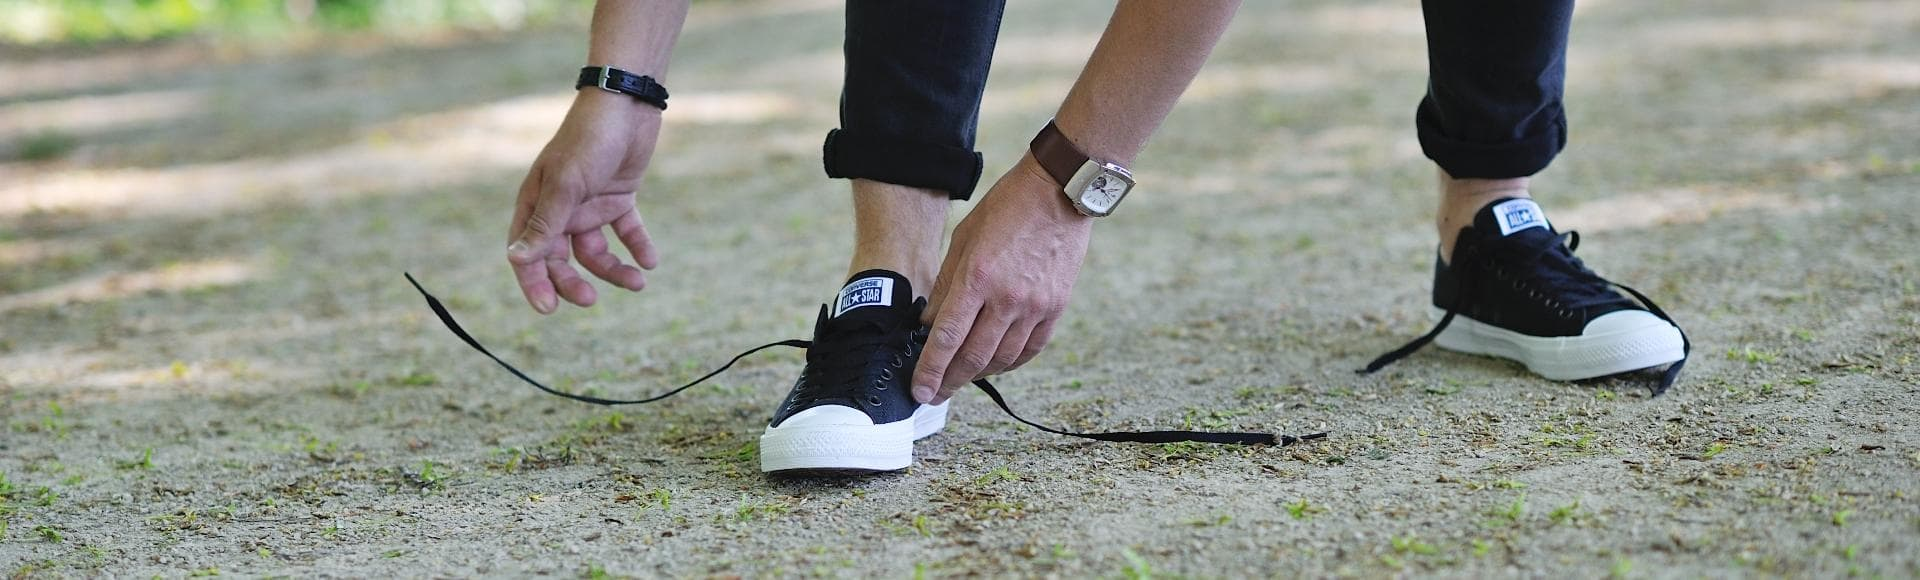 Converce footwear, Converce shoes - Sportsman24